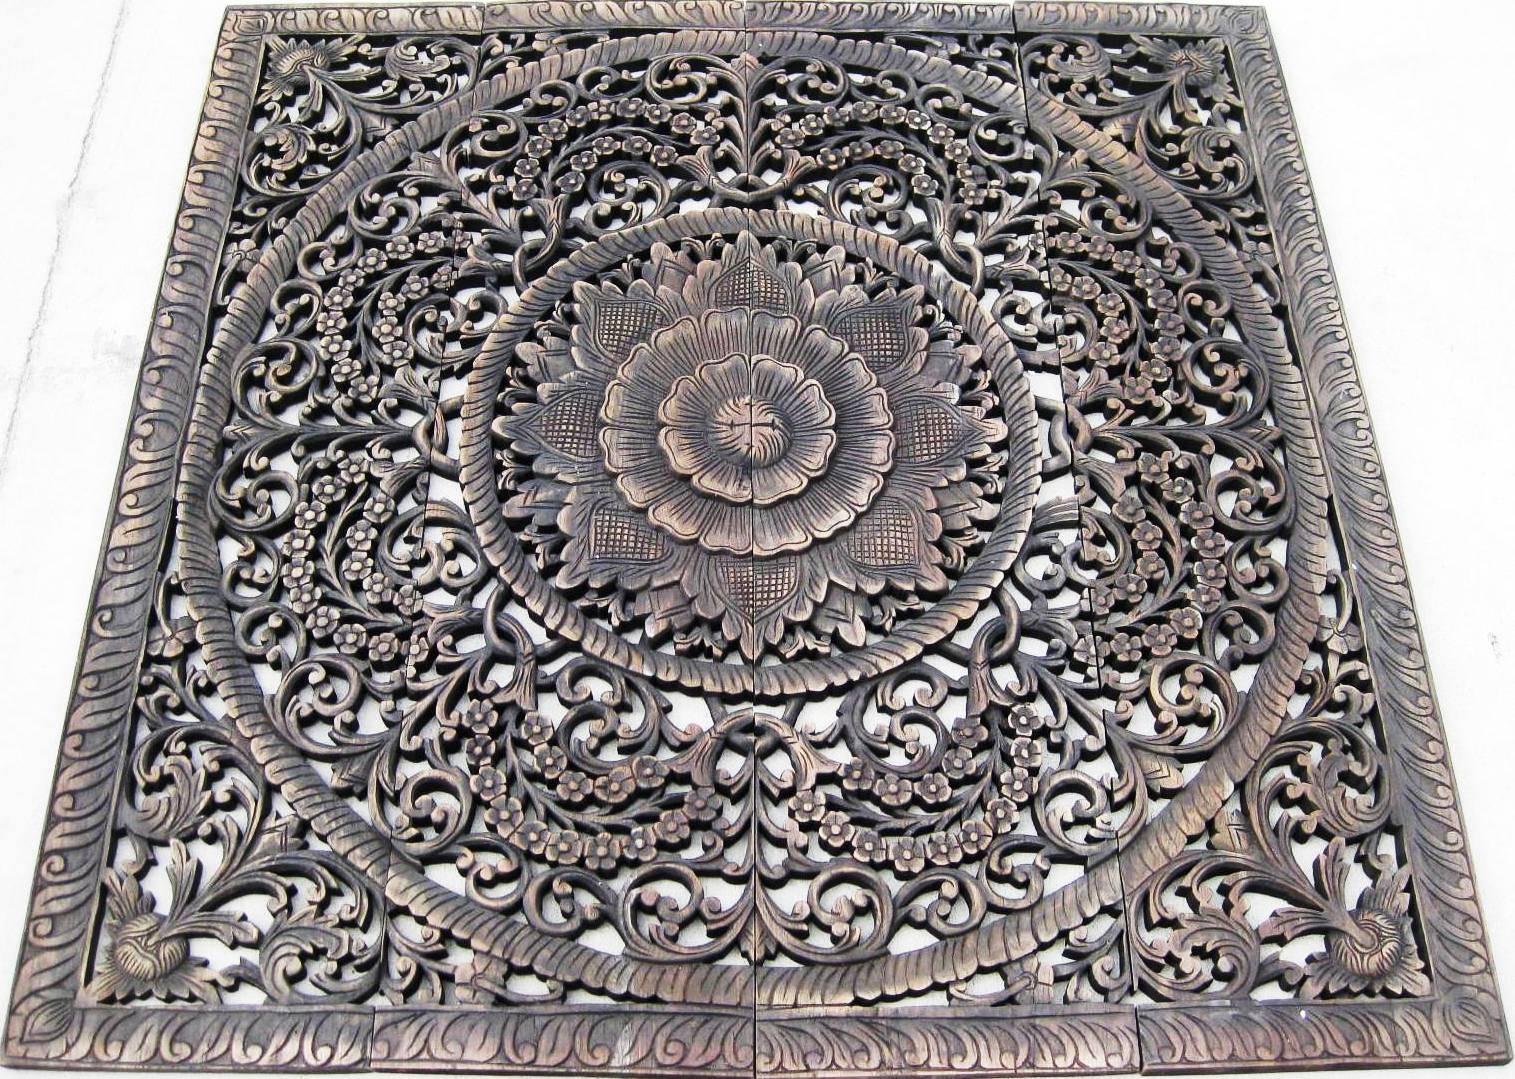 Hand Carved Teak Panel/teak Wood Panels/teak Wood Carvings In Most Popular Wood Carved Wall Art Panels (View 12 of 25)